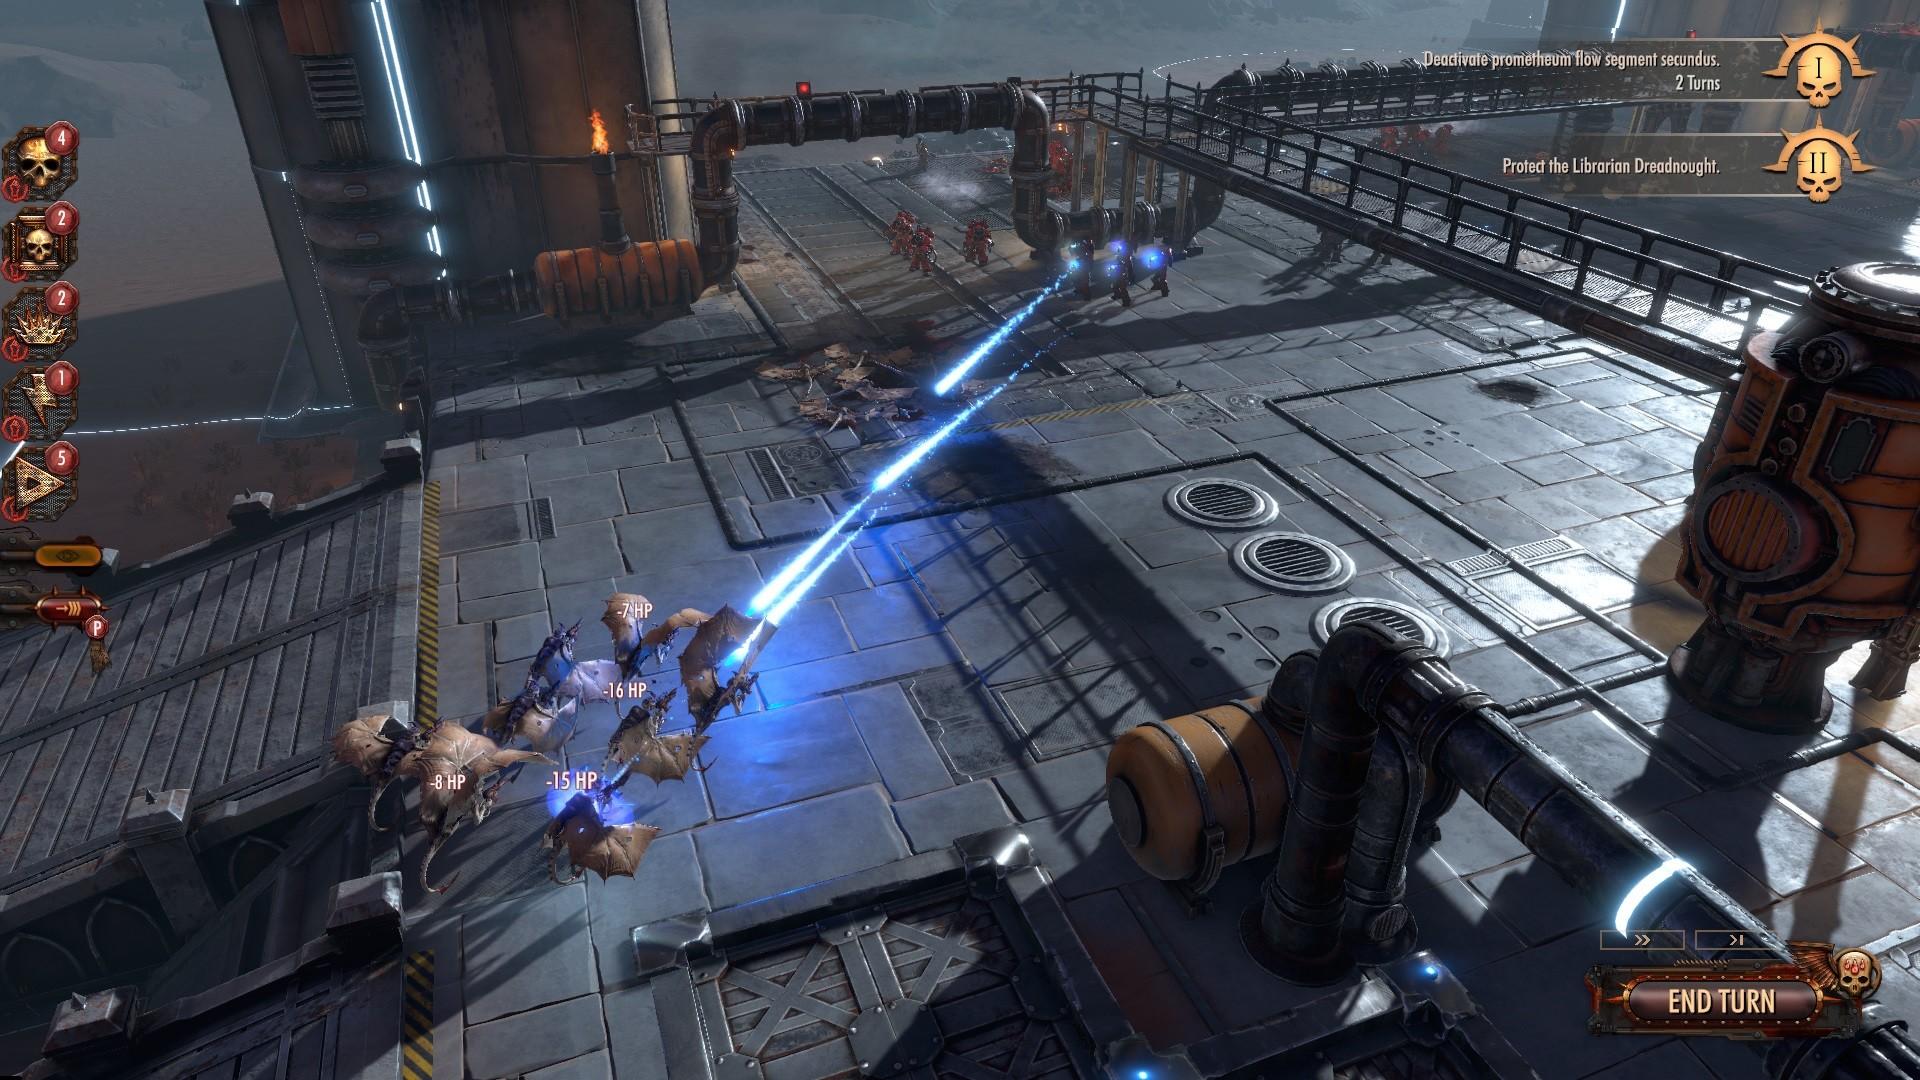 战锤40K:作战区域/Warhammer 40,000: Battlesector